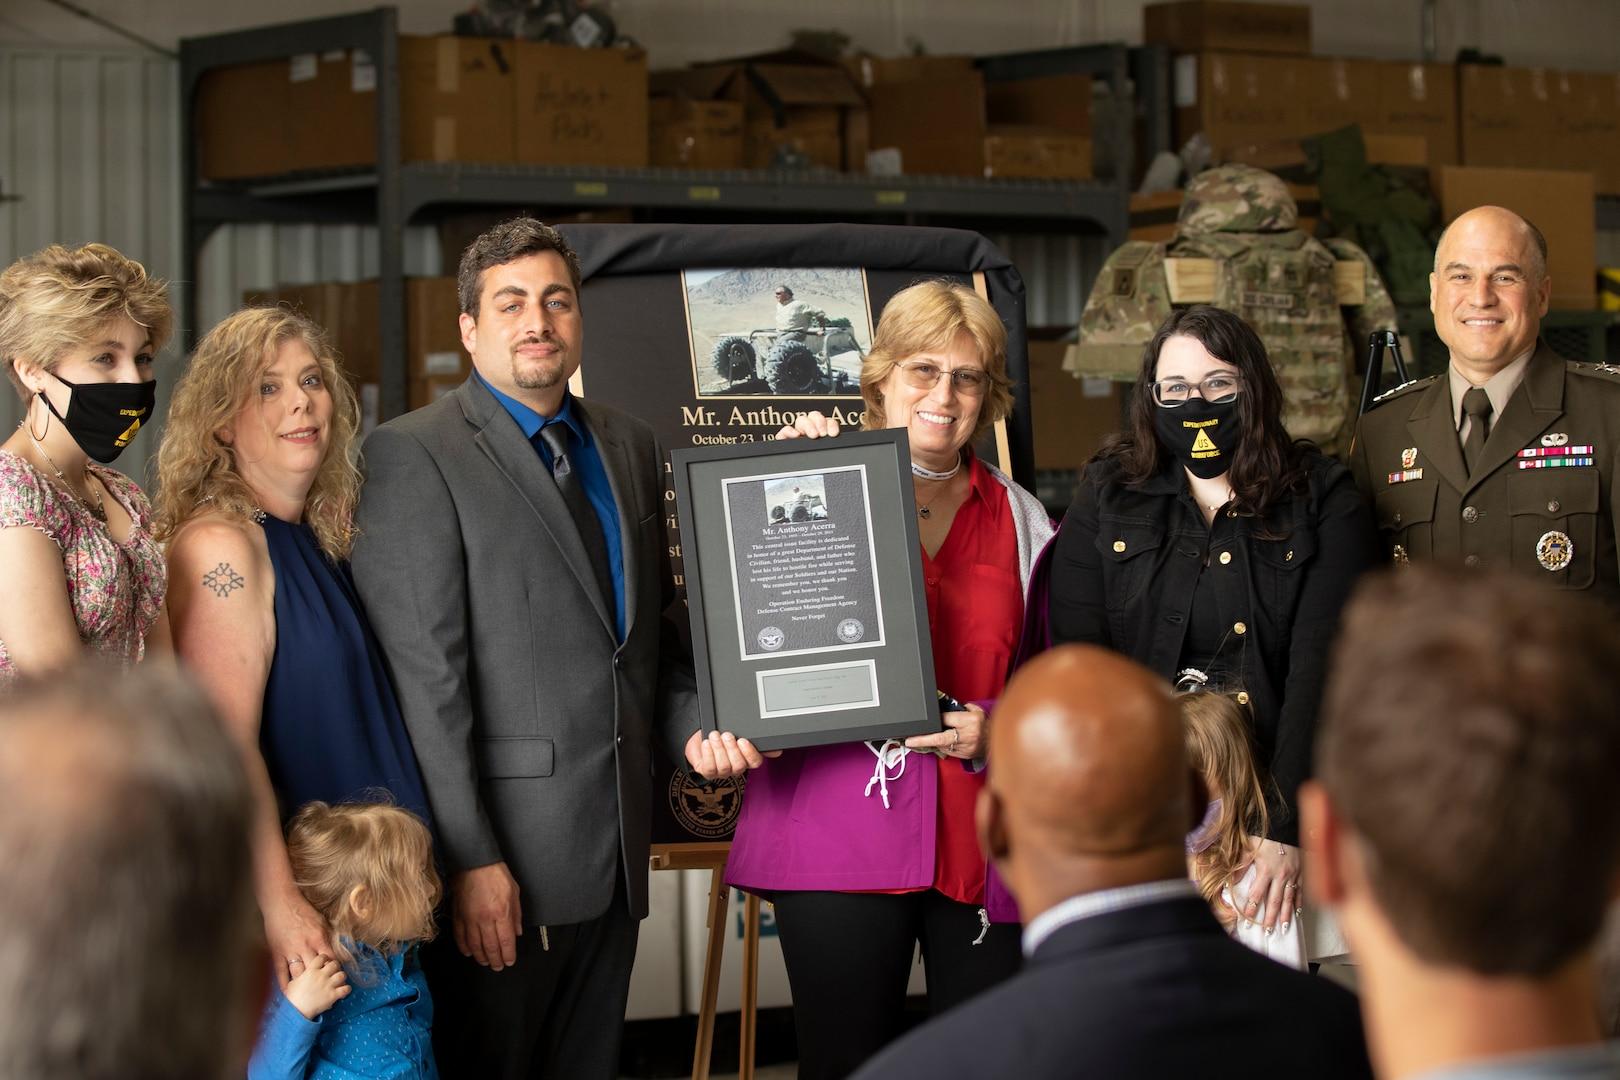 Tony Acerra's family stands with Lt. Gen. David Basset.